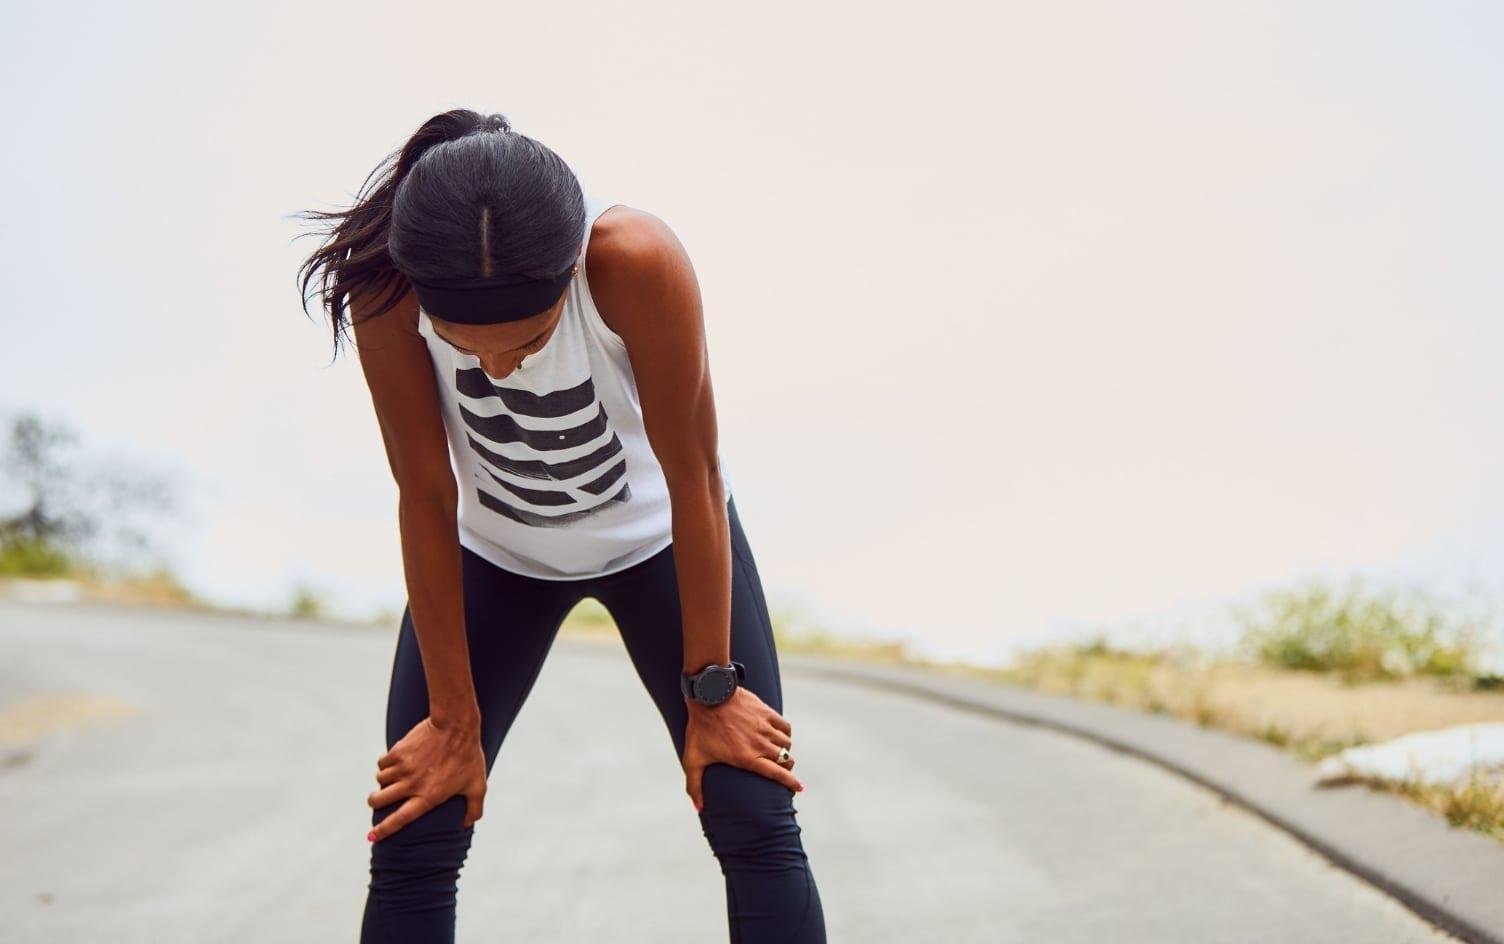 Efek Samping Jika Tubuh Berhenti Olahraga